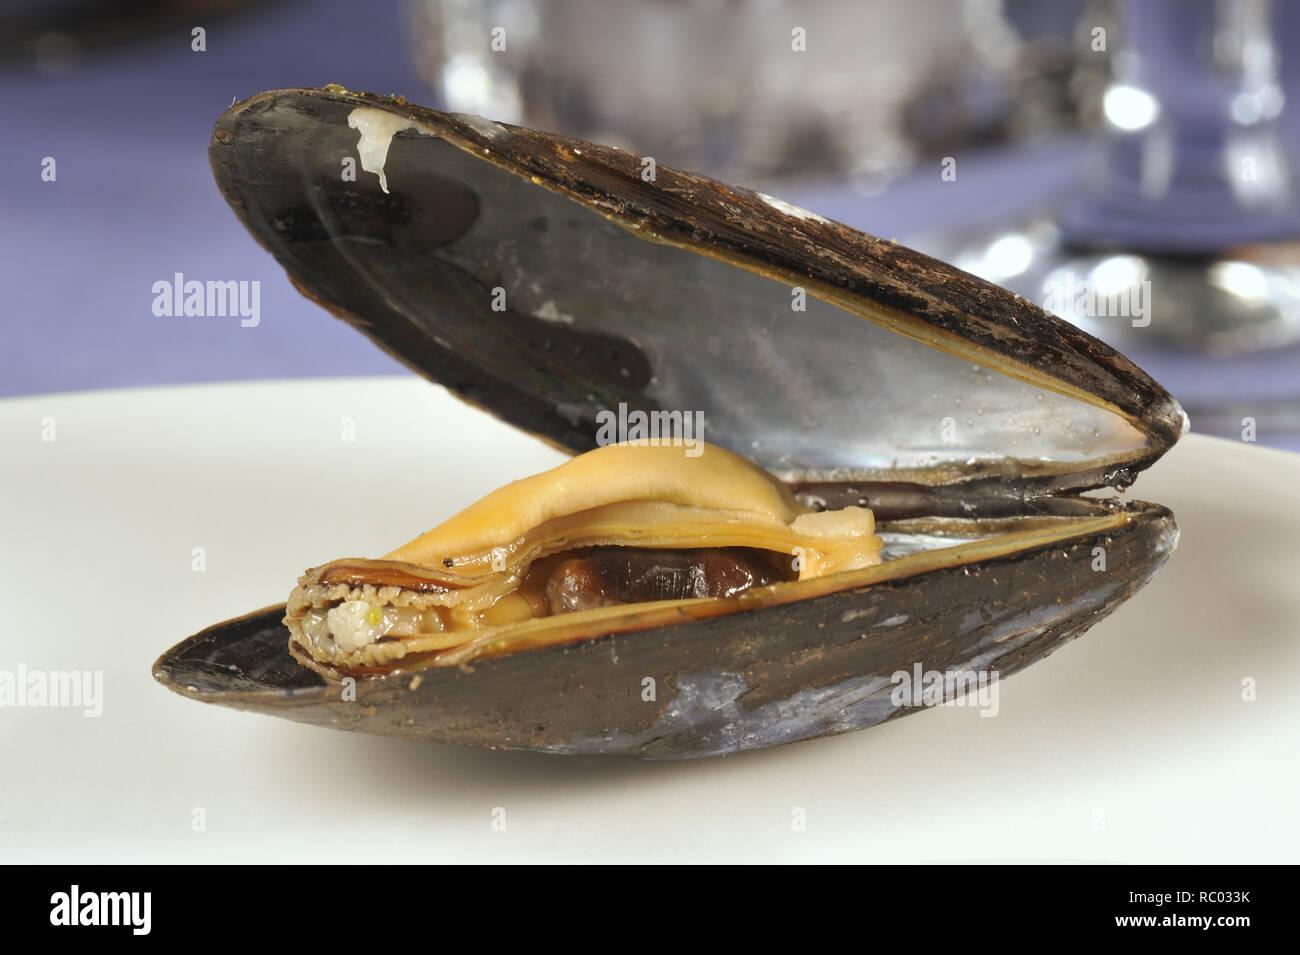 Frische Miesmuschel | Fresh mussel in a shell - Stock Image